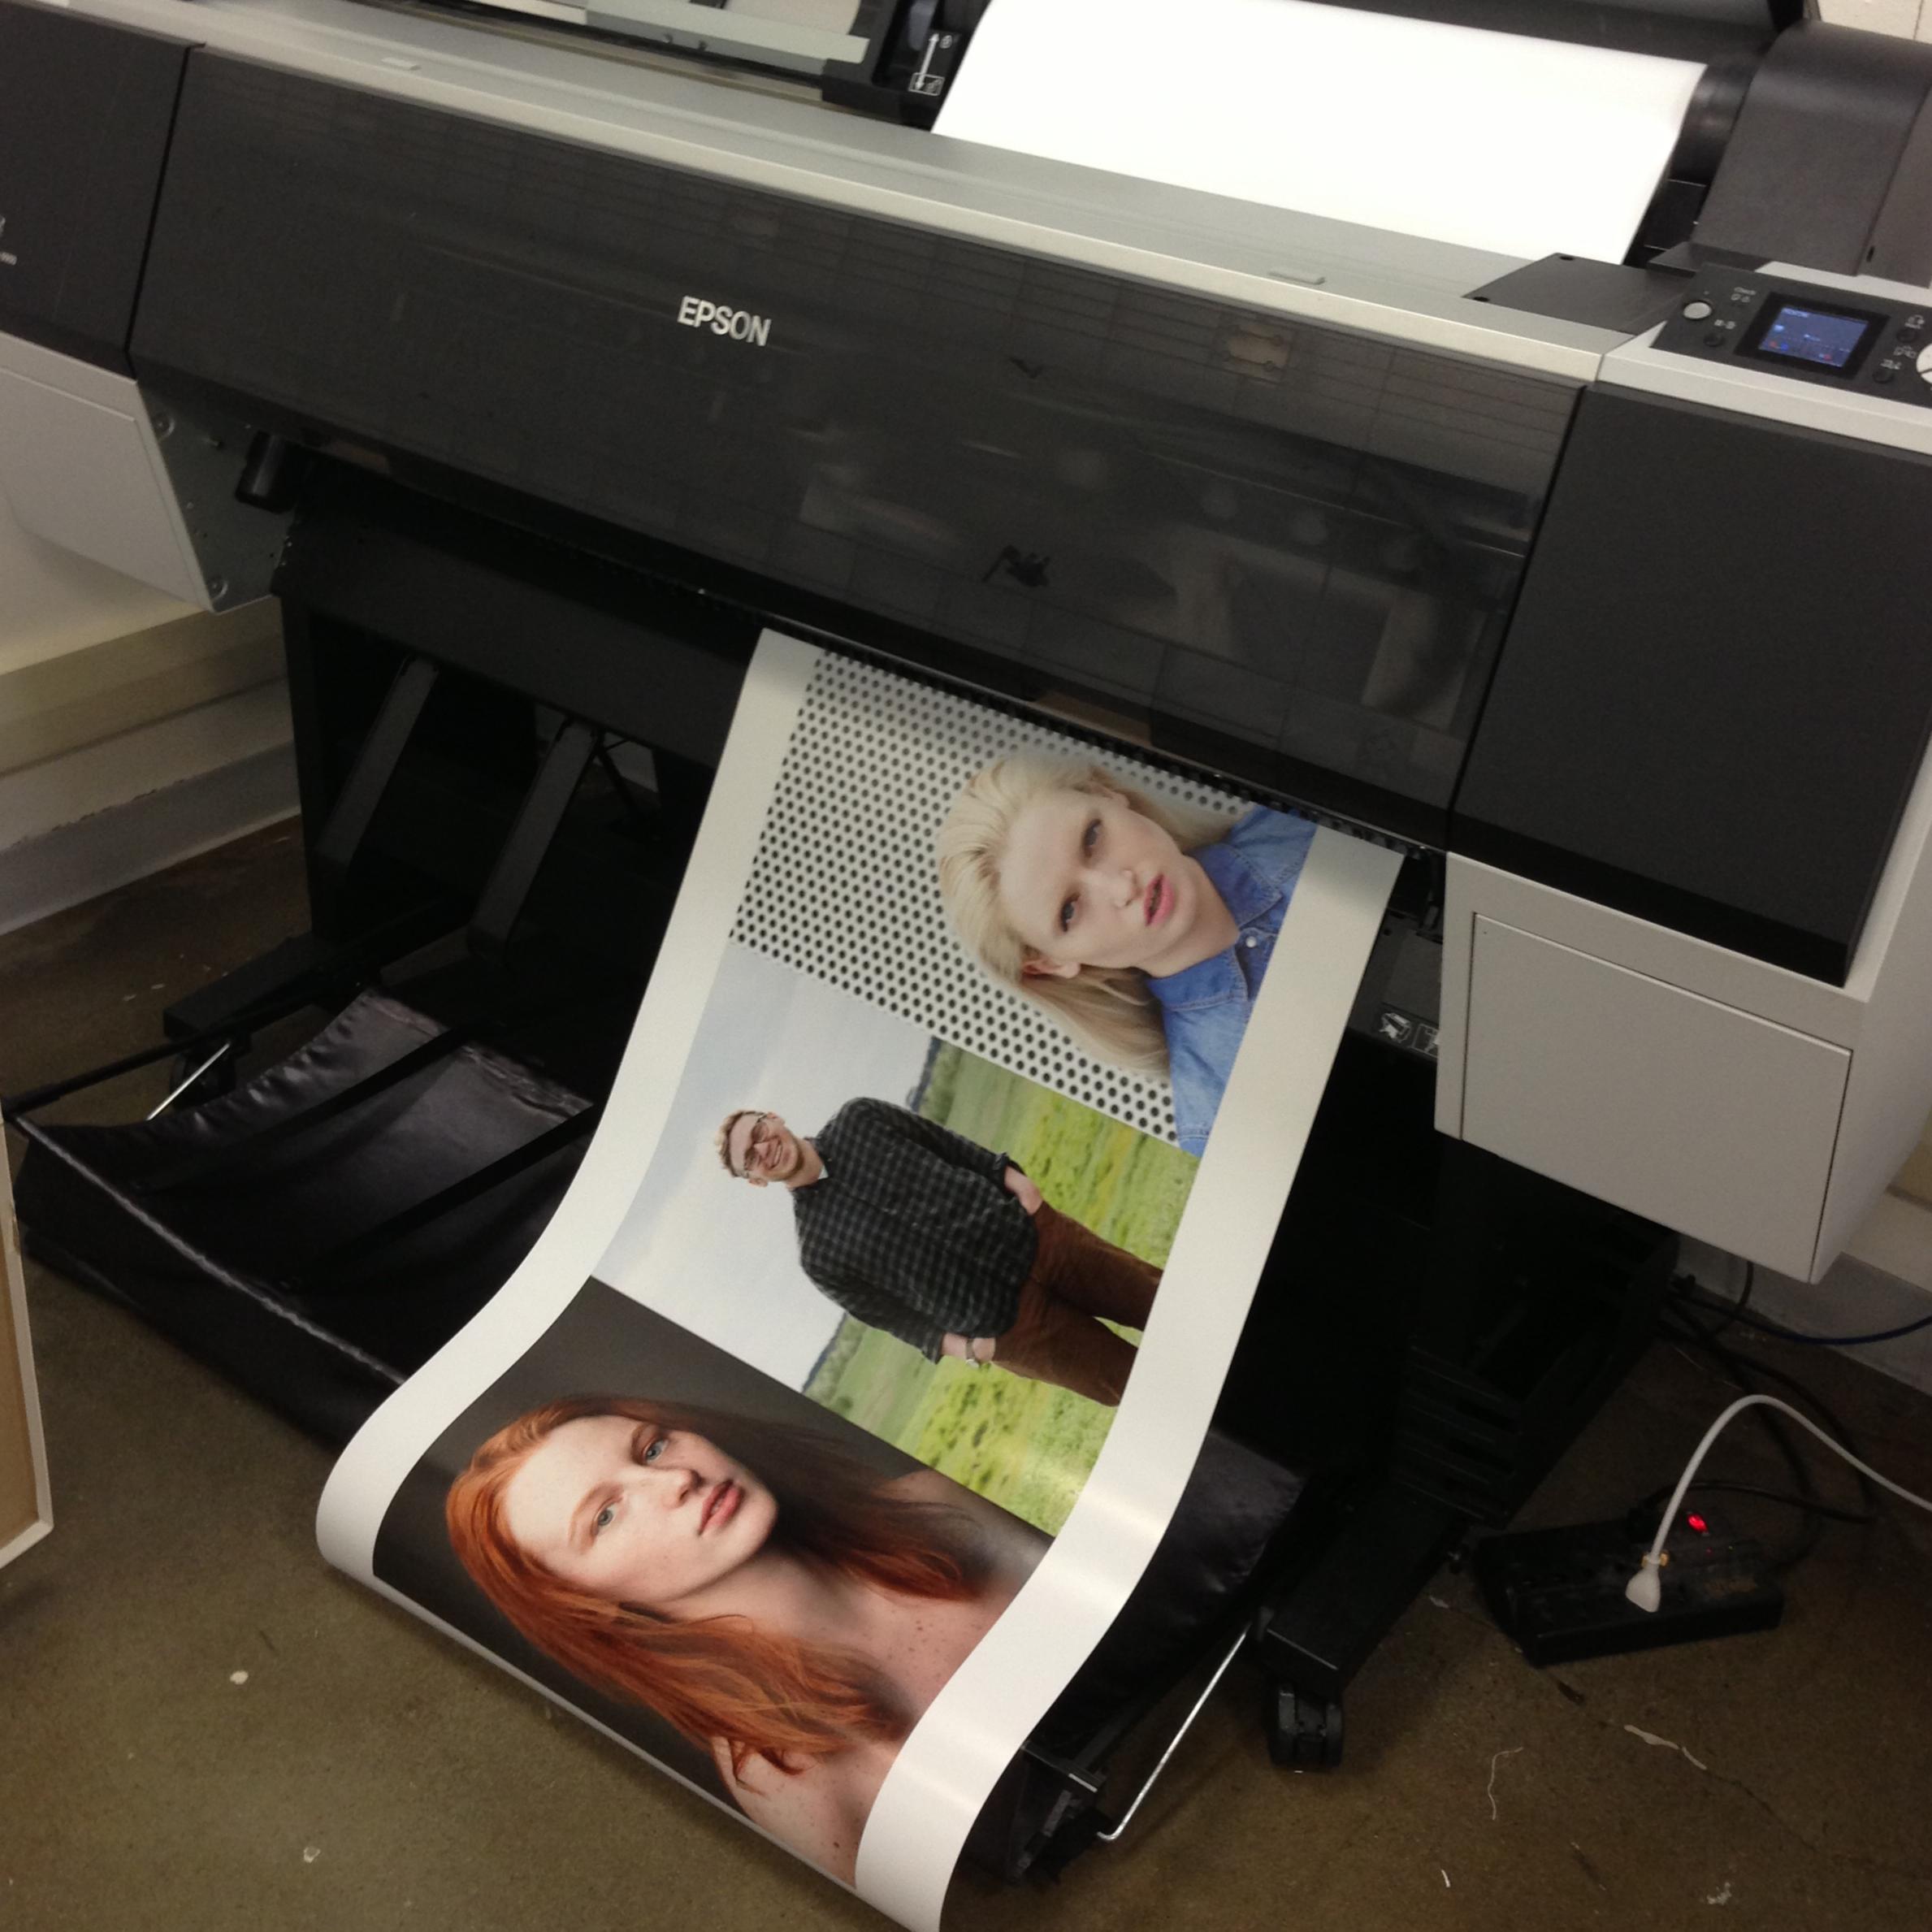 Printing up a 5 foot banner